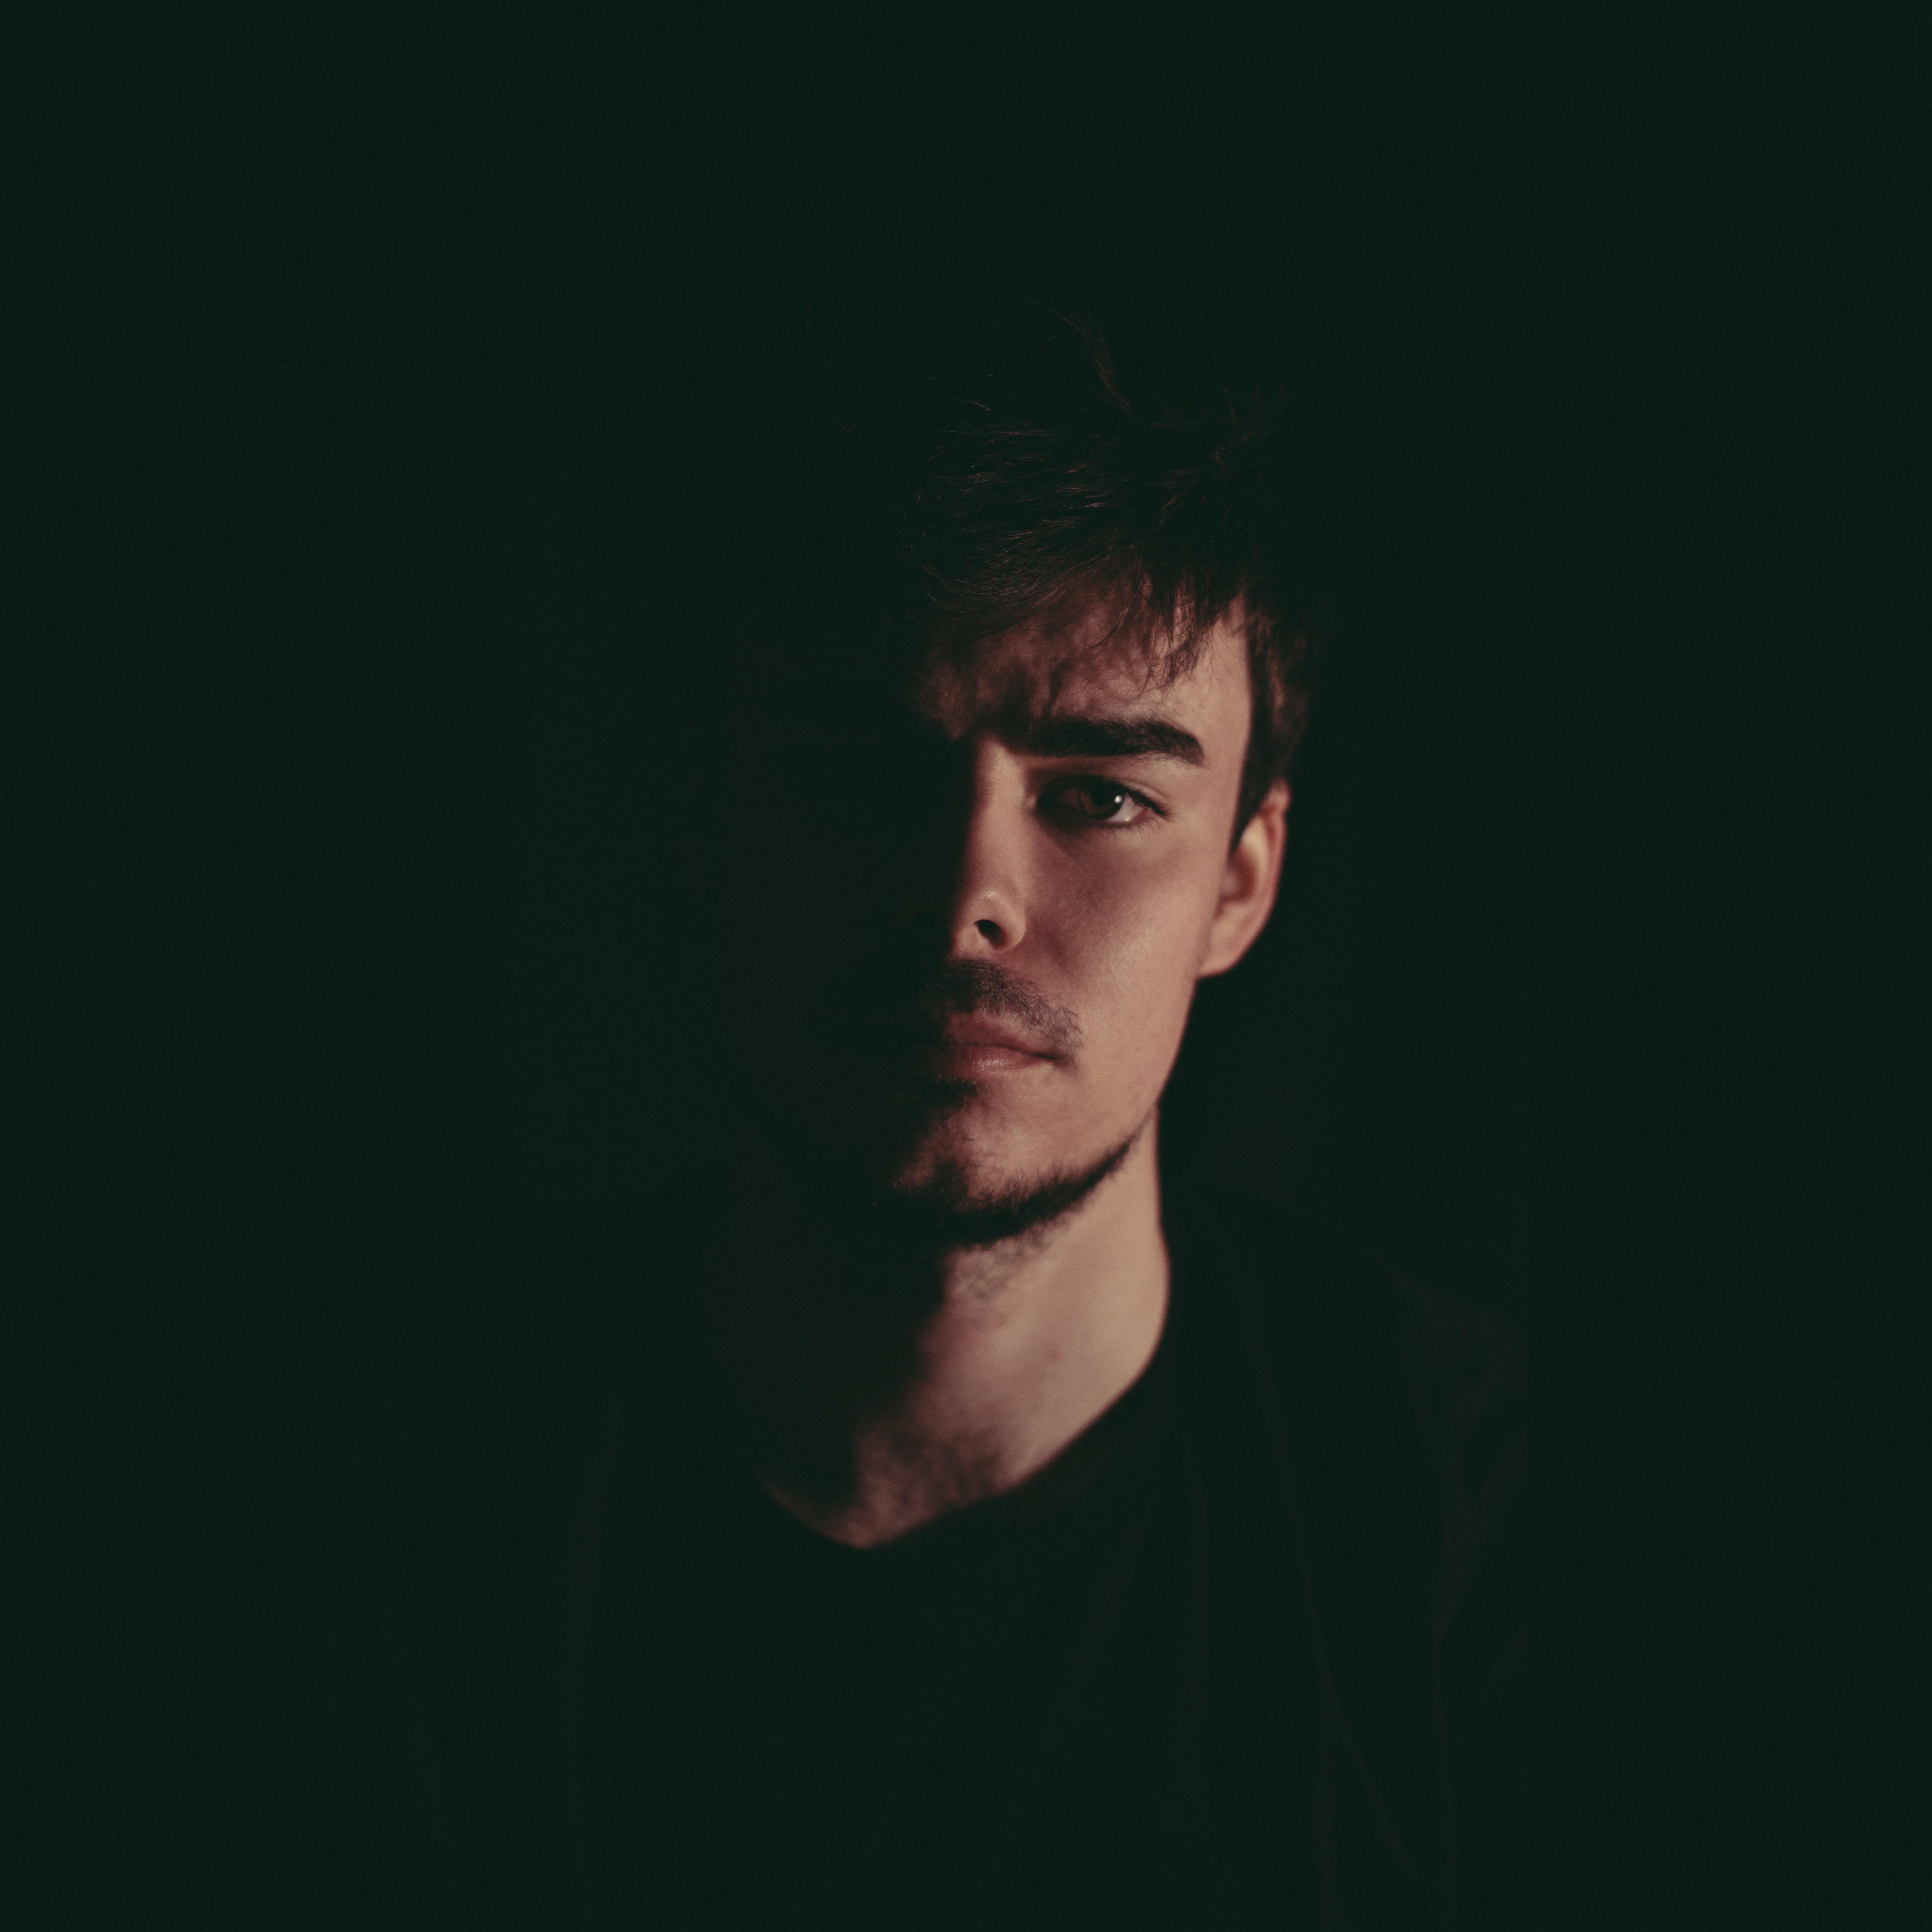 man standing on dark area